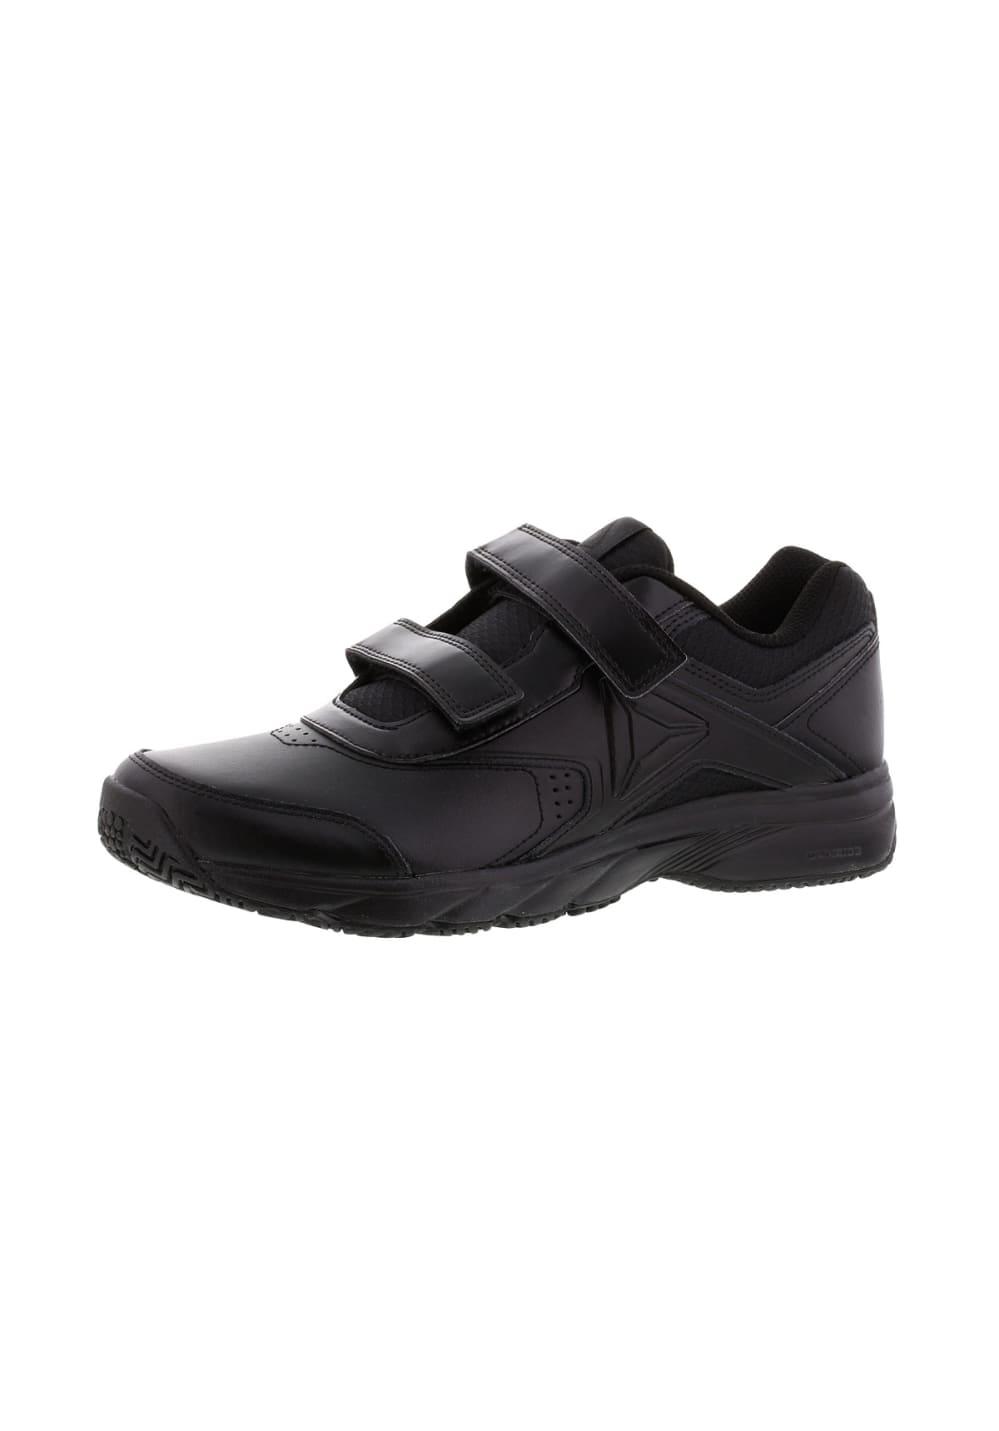 Reebok Work N Cushion 3 0 Kc Walking Shoes For Women Black